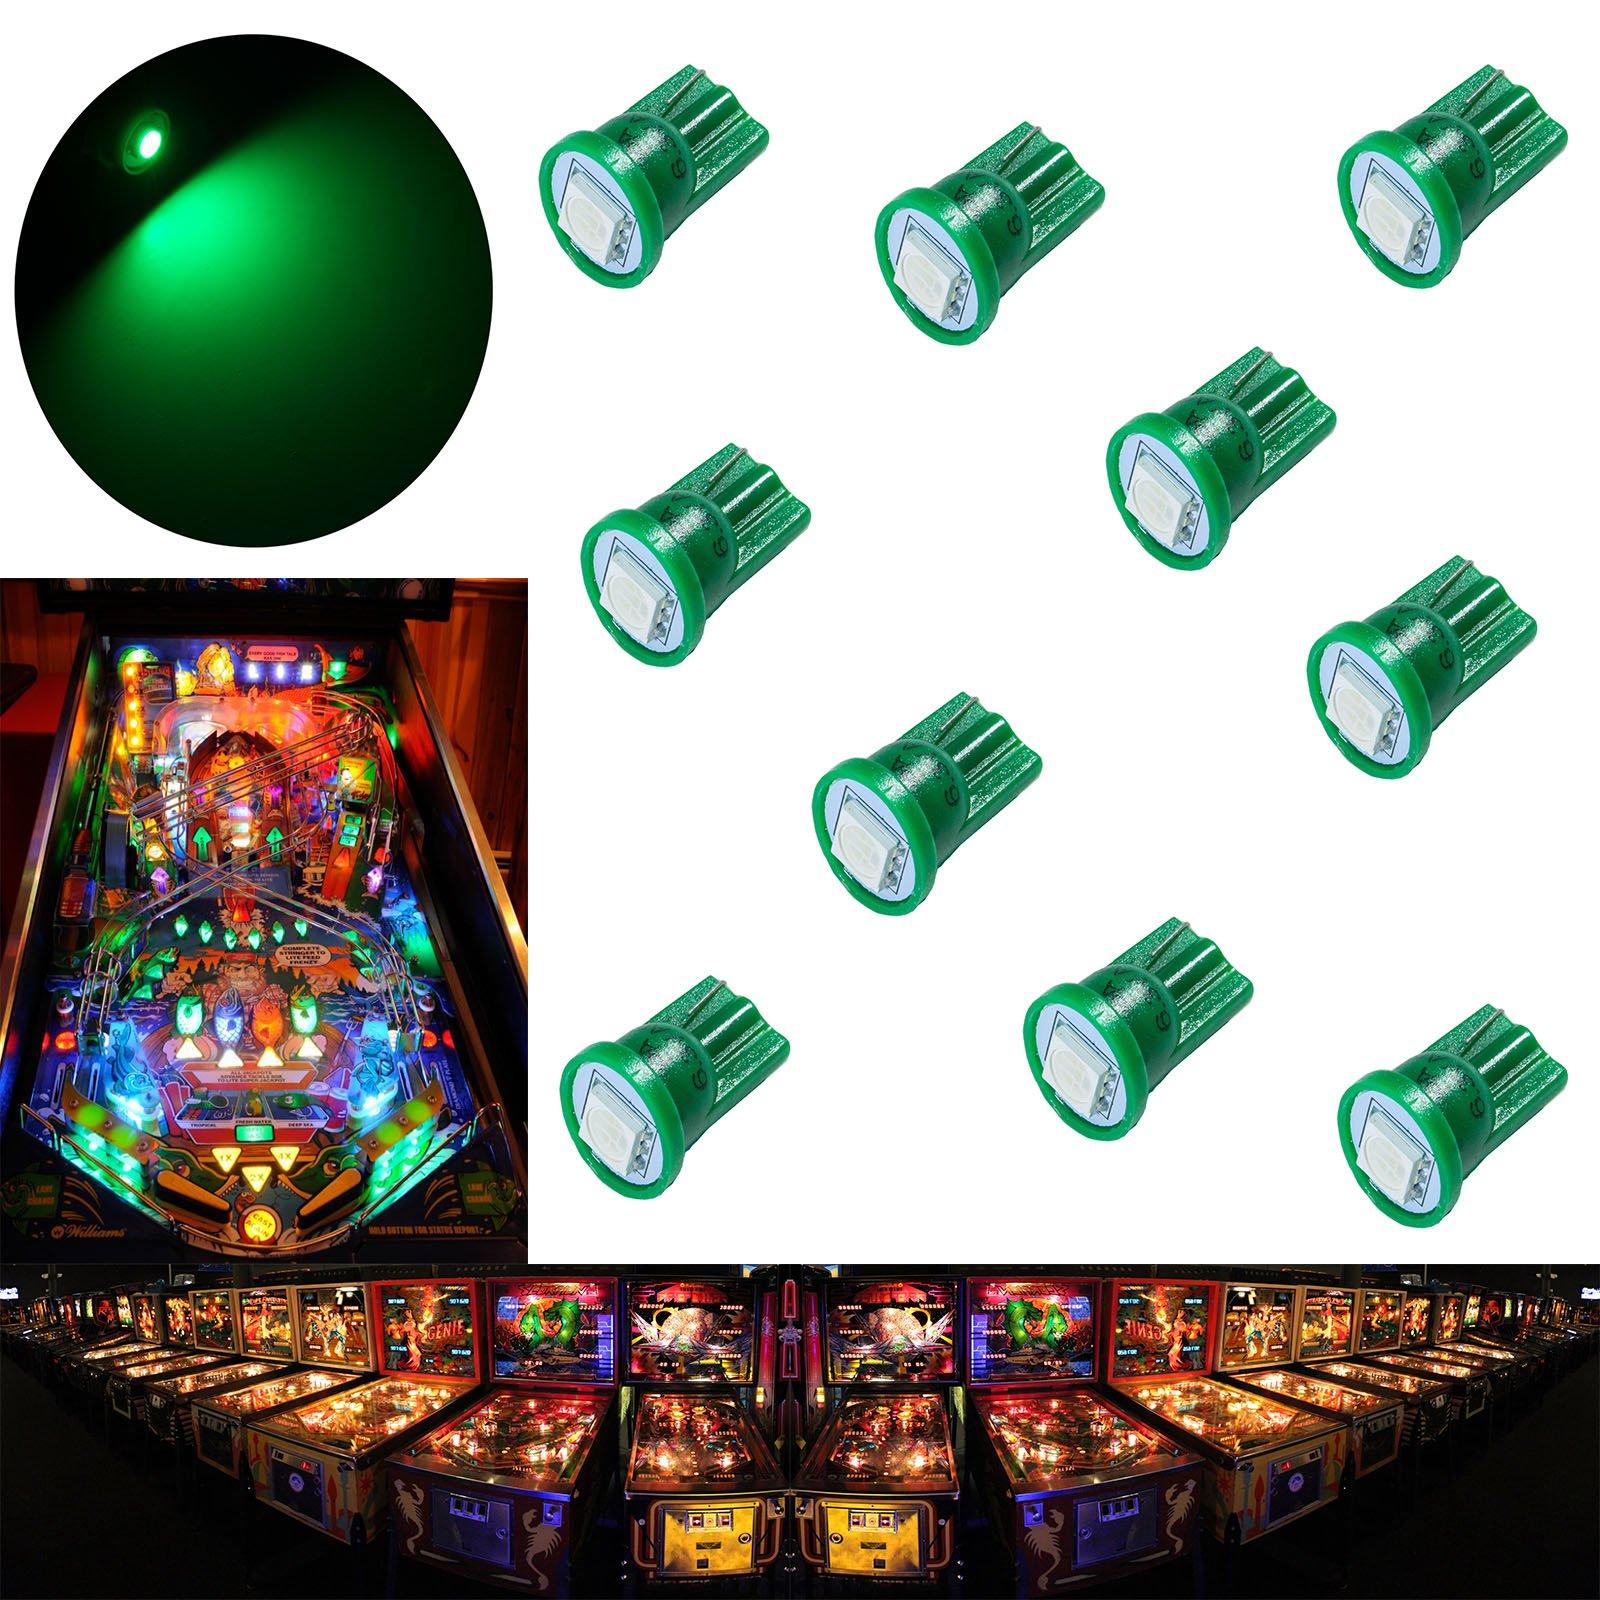 PA 10PCS #555 T10 1SMD LED Wedge Pinball Machine Light Top View Bulb Green-6.3V by PA